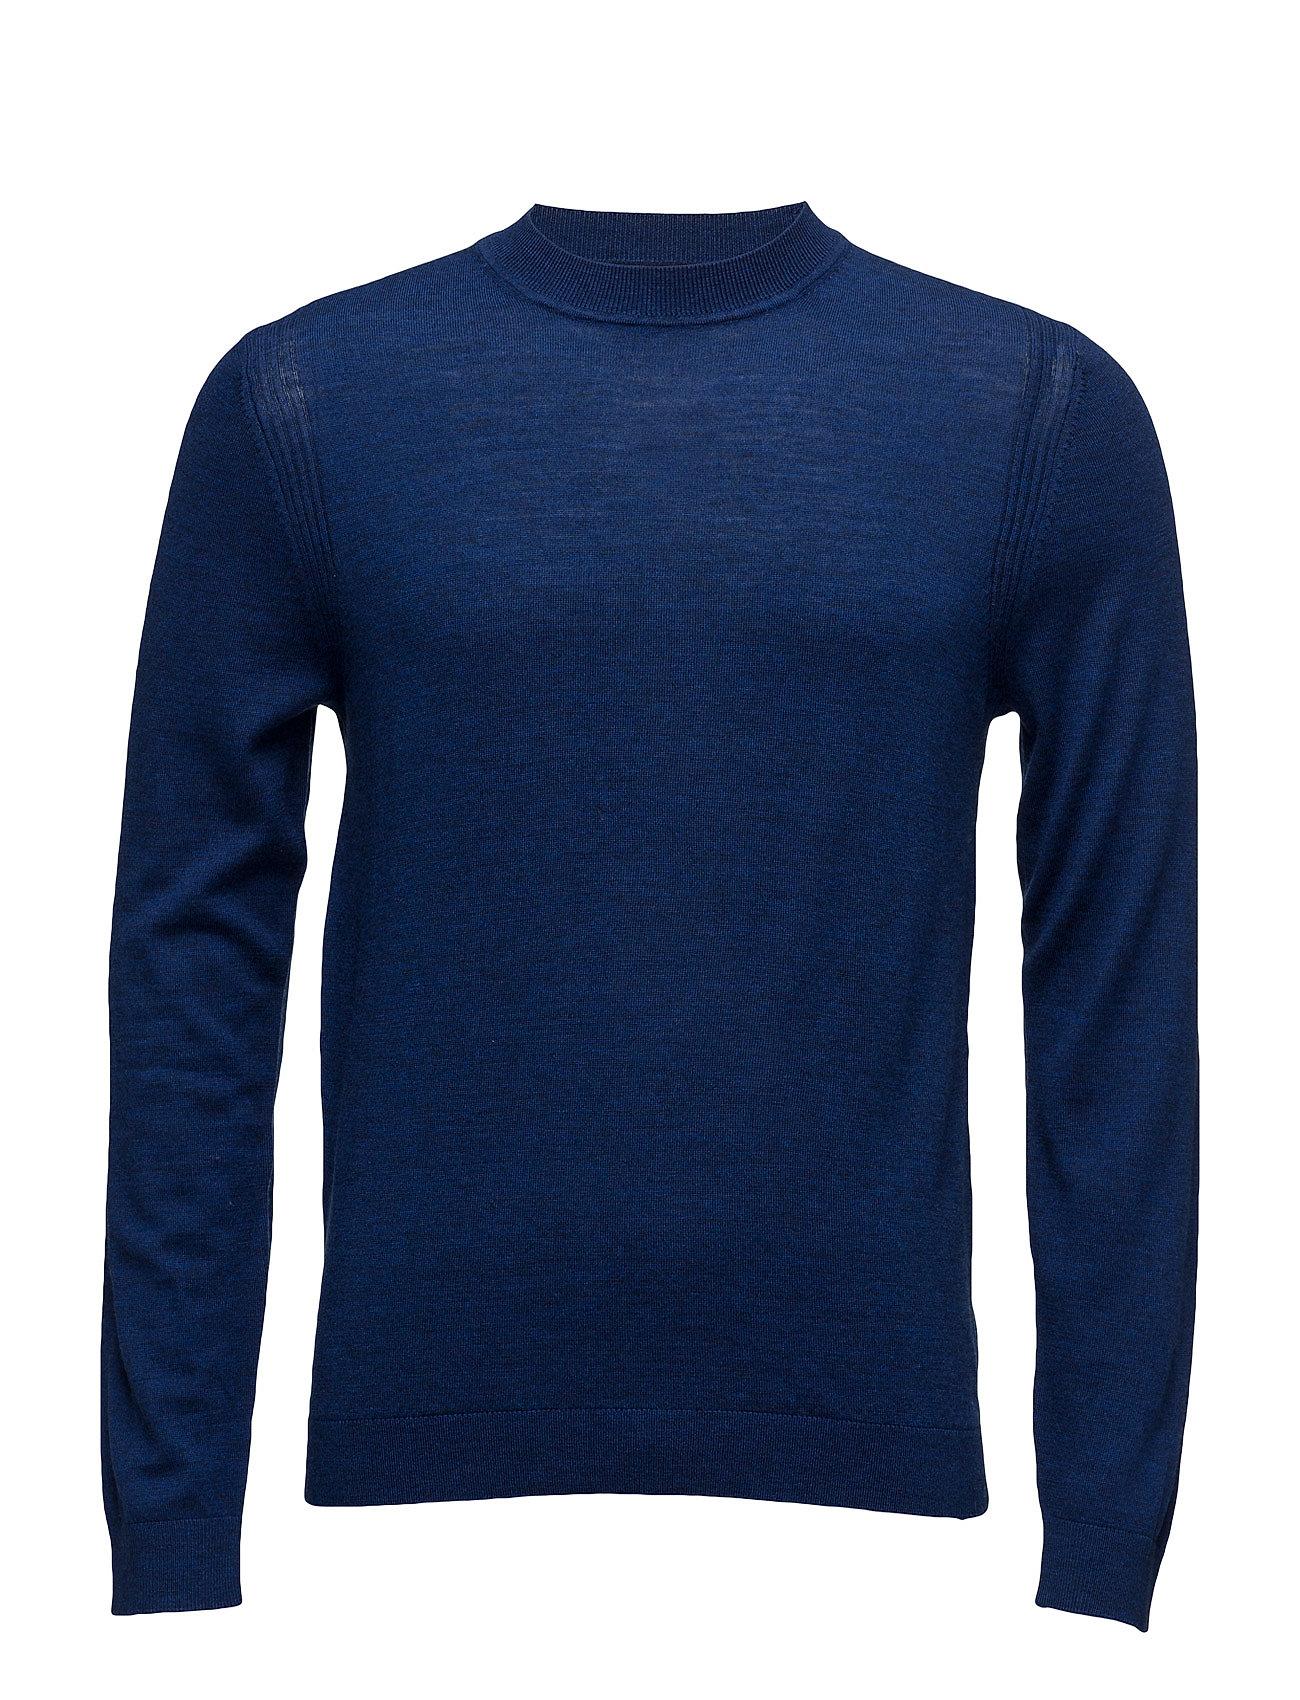 Wool-Blend Knit Sweater Mango Man Rundhalsede til Herrer i Medium Blå